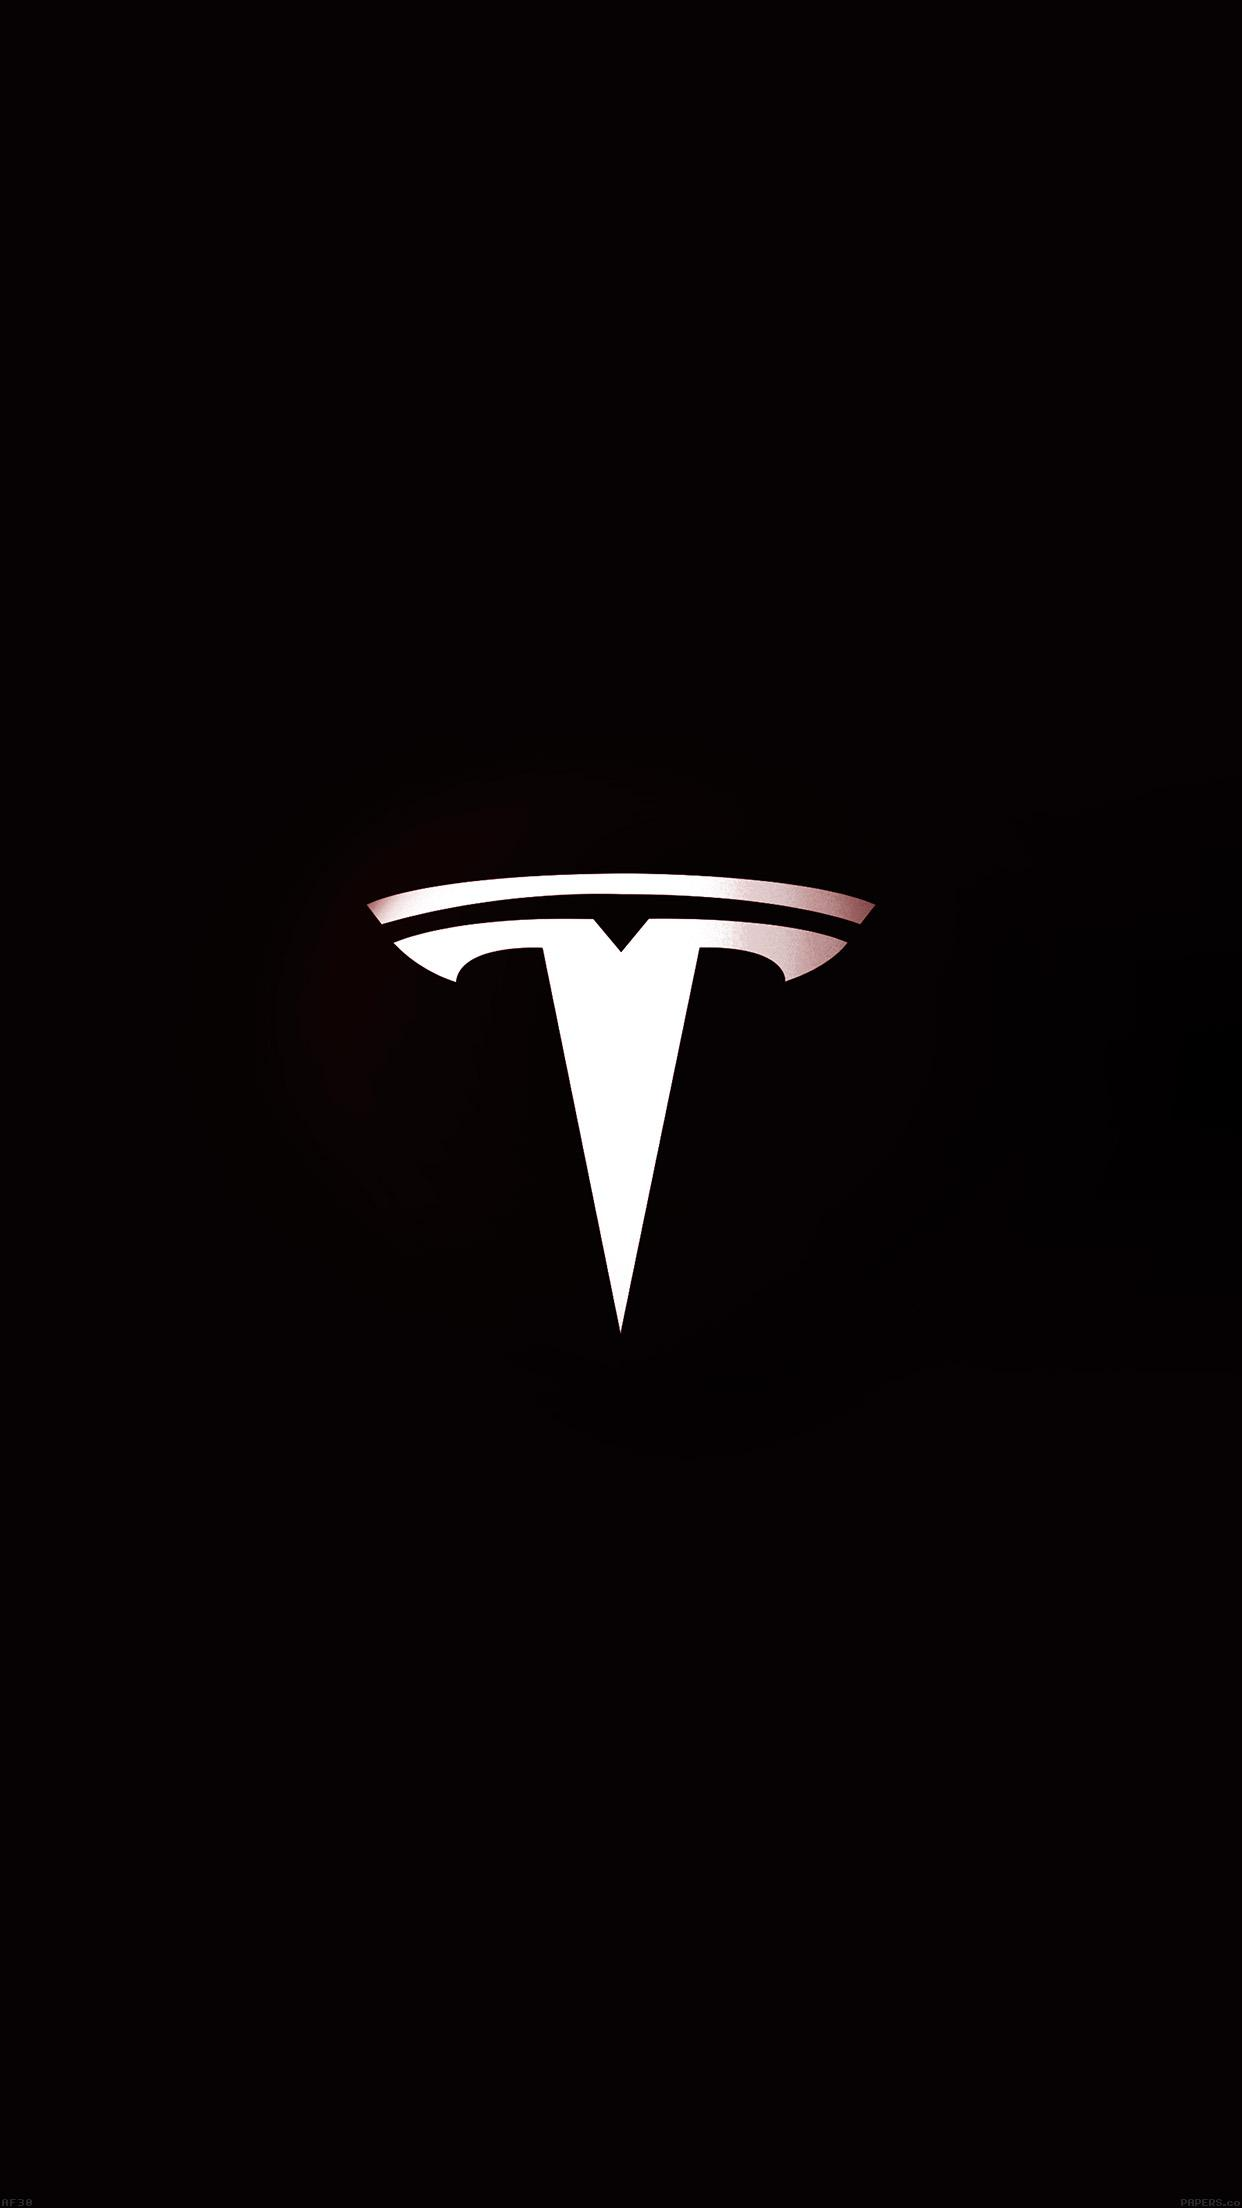 Tesla Wallpaper Iphone 27 images on Genchiinfo 1242x2208